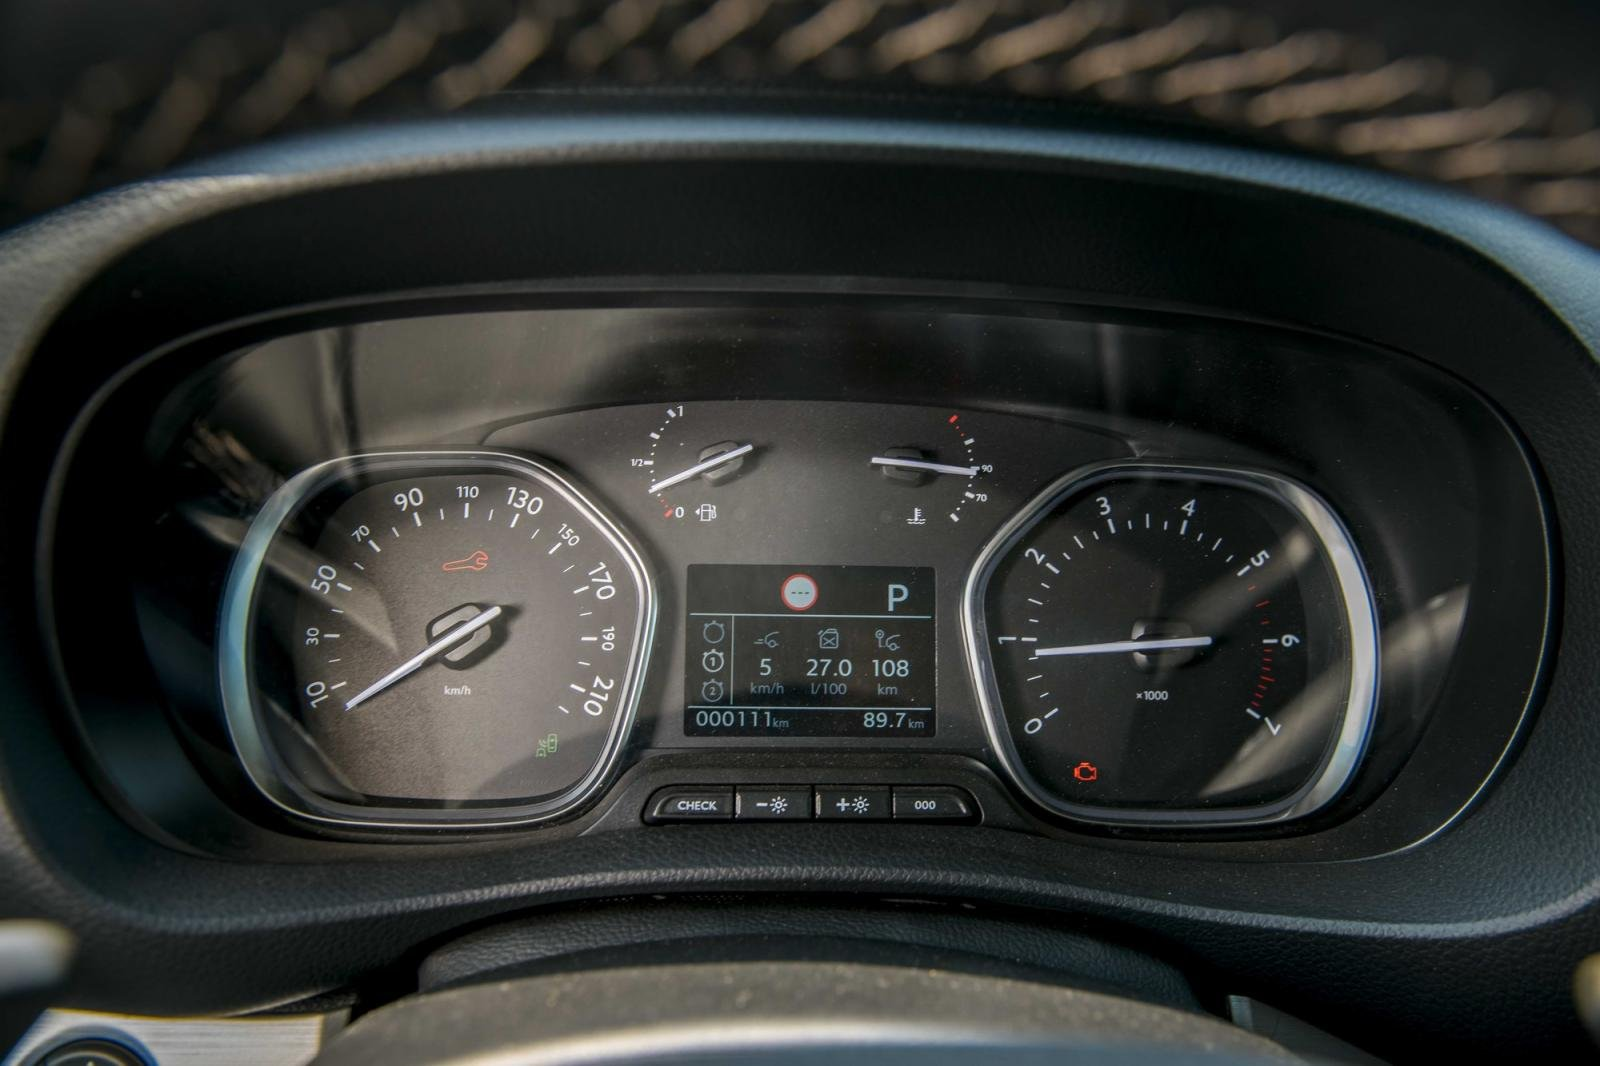 đồng hồ thông tin Peugeot Traveller 2021 .